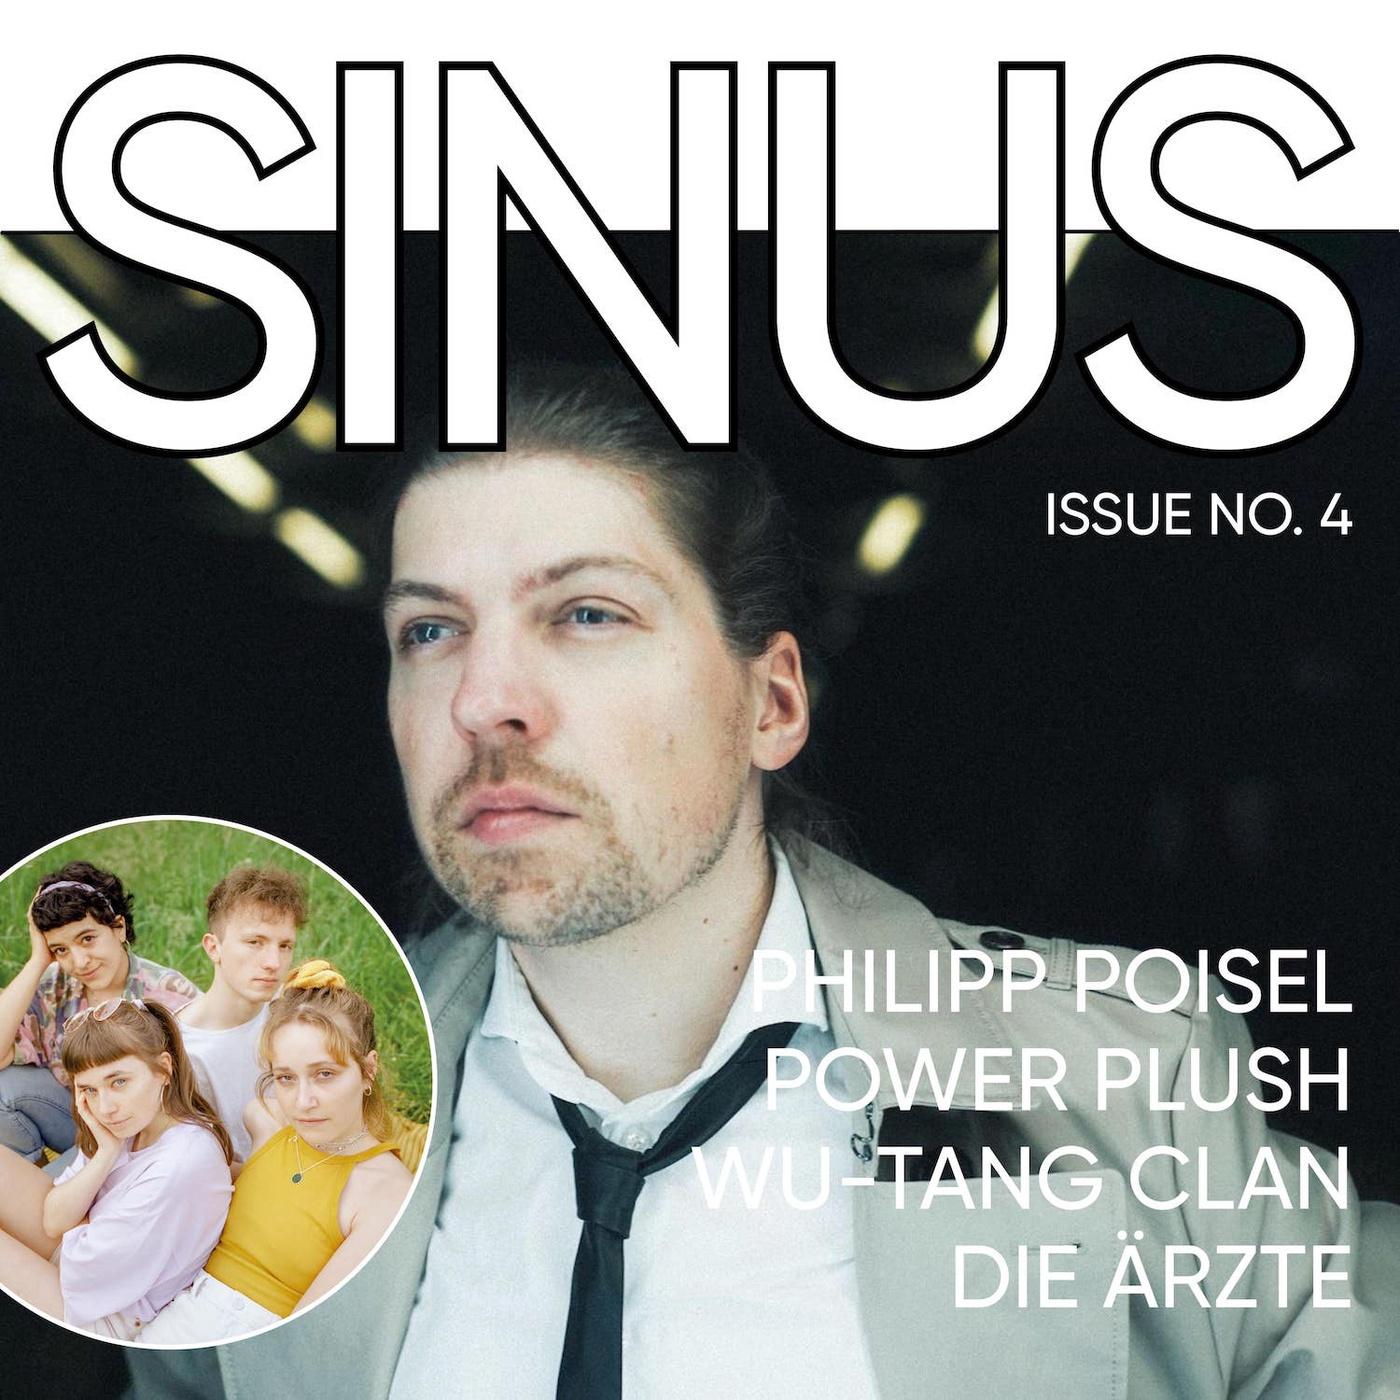 #4 Philipp Poisel, Power Plush, Wu-Tang Clan, Die Ärzte